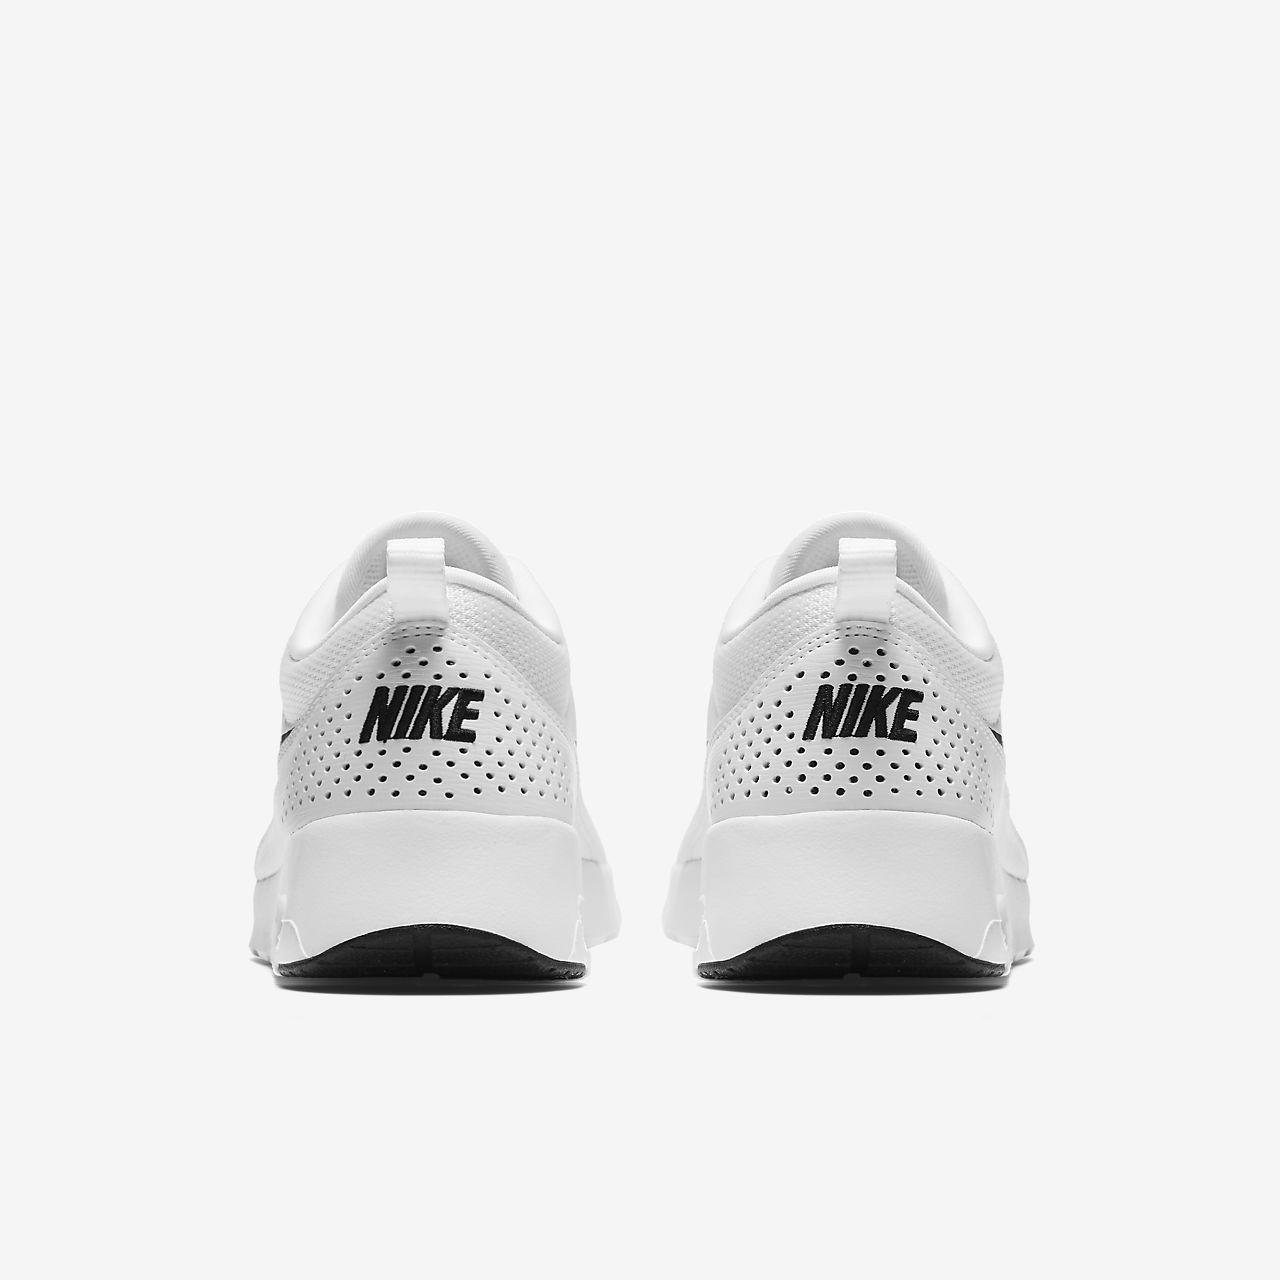 edb76615da Nike Air Max Thea Women's Shoe. Nike.com AU